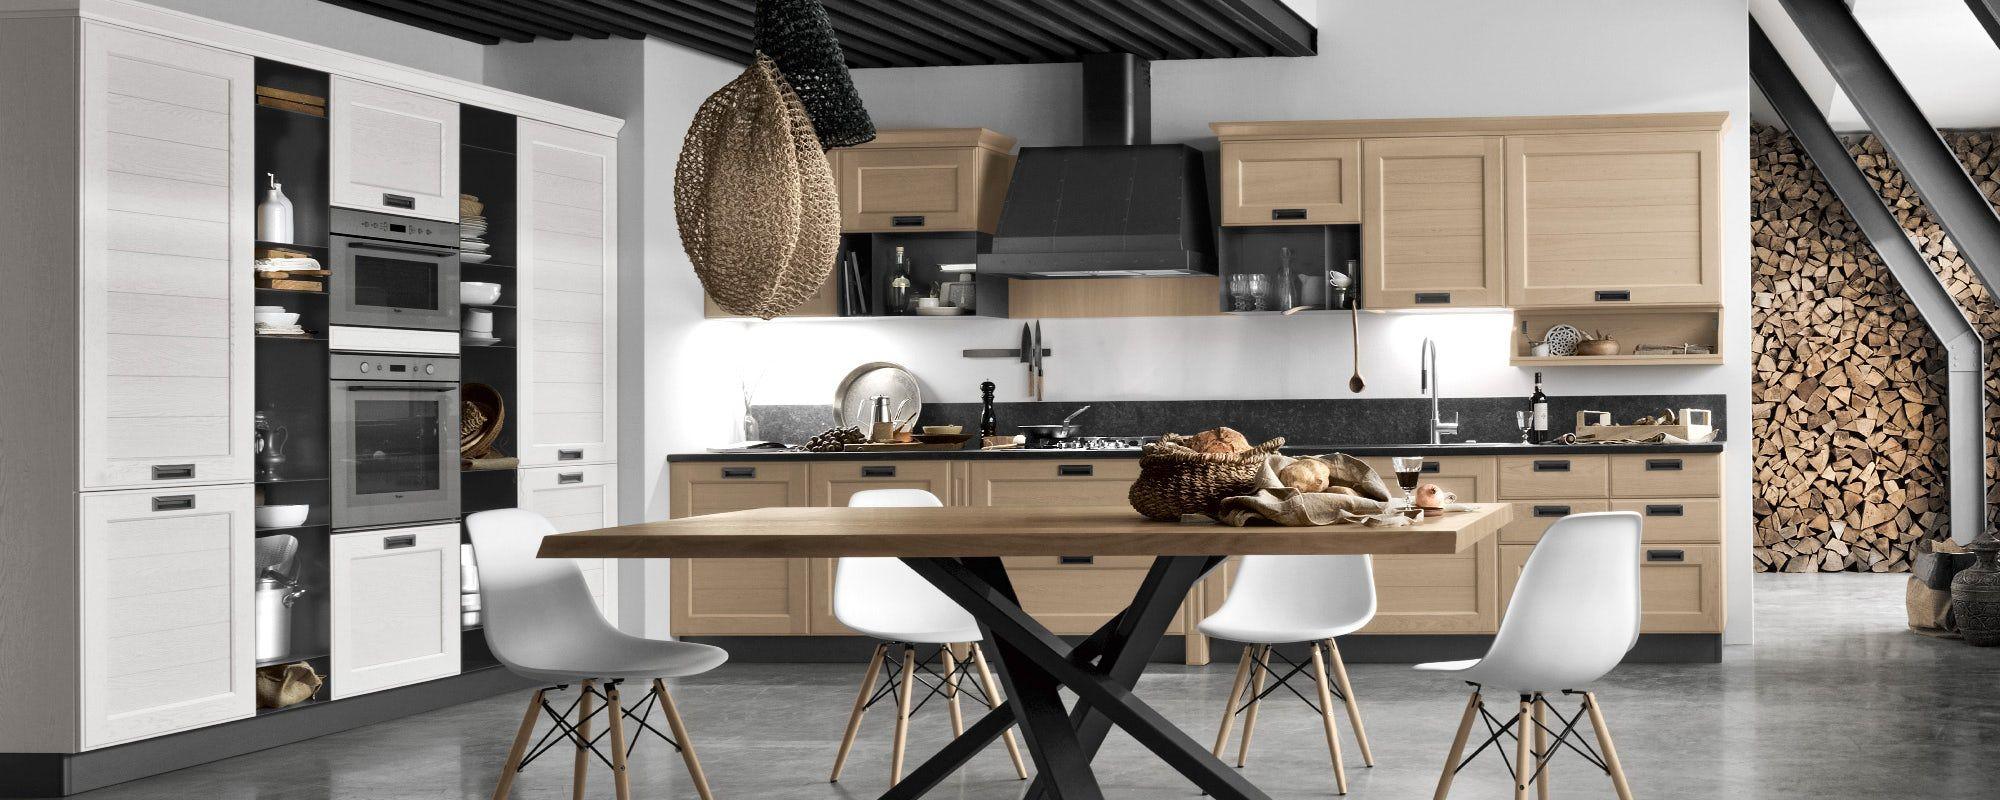 cucine moderne contemporanee stosa - modello cucina york 04 | Cucine ...